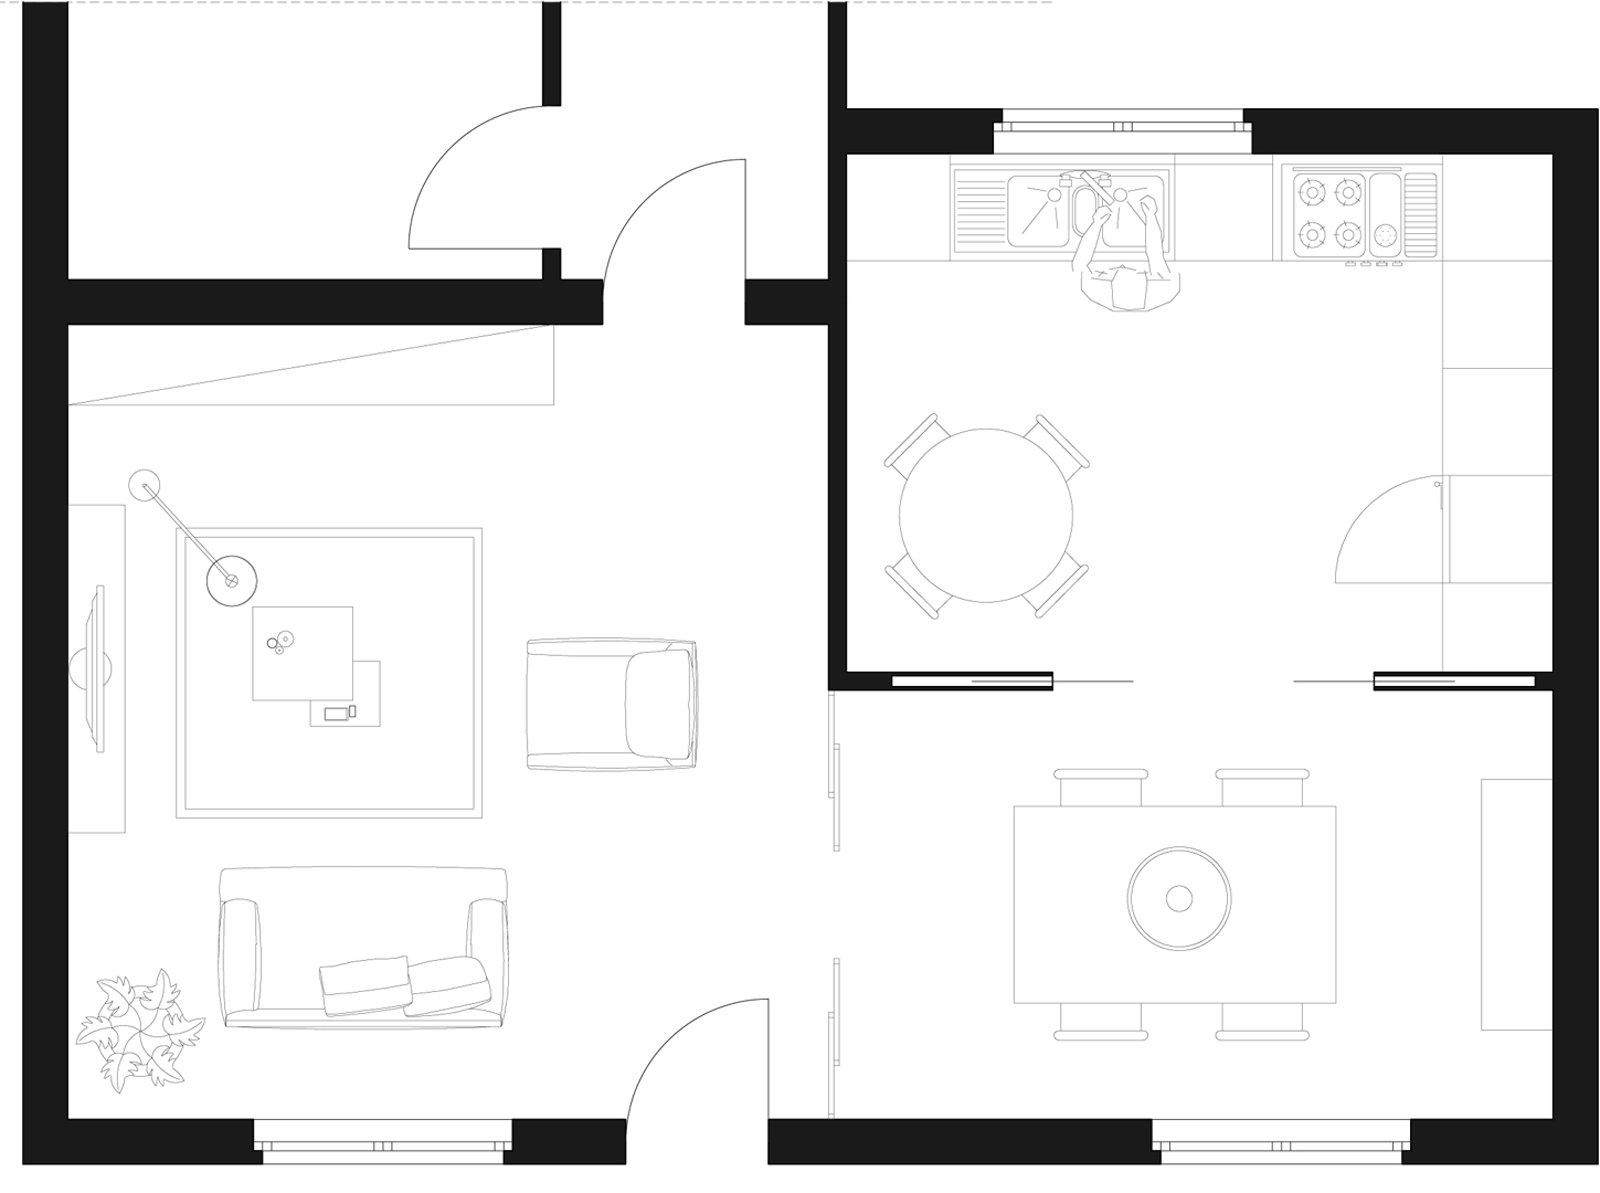 soggiorno e sala da pranzo insieme | madgeweb.com idee di interior ... - Sala Da Pranzo E Soggiorno Insieme 2